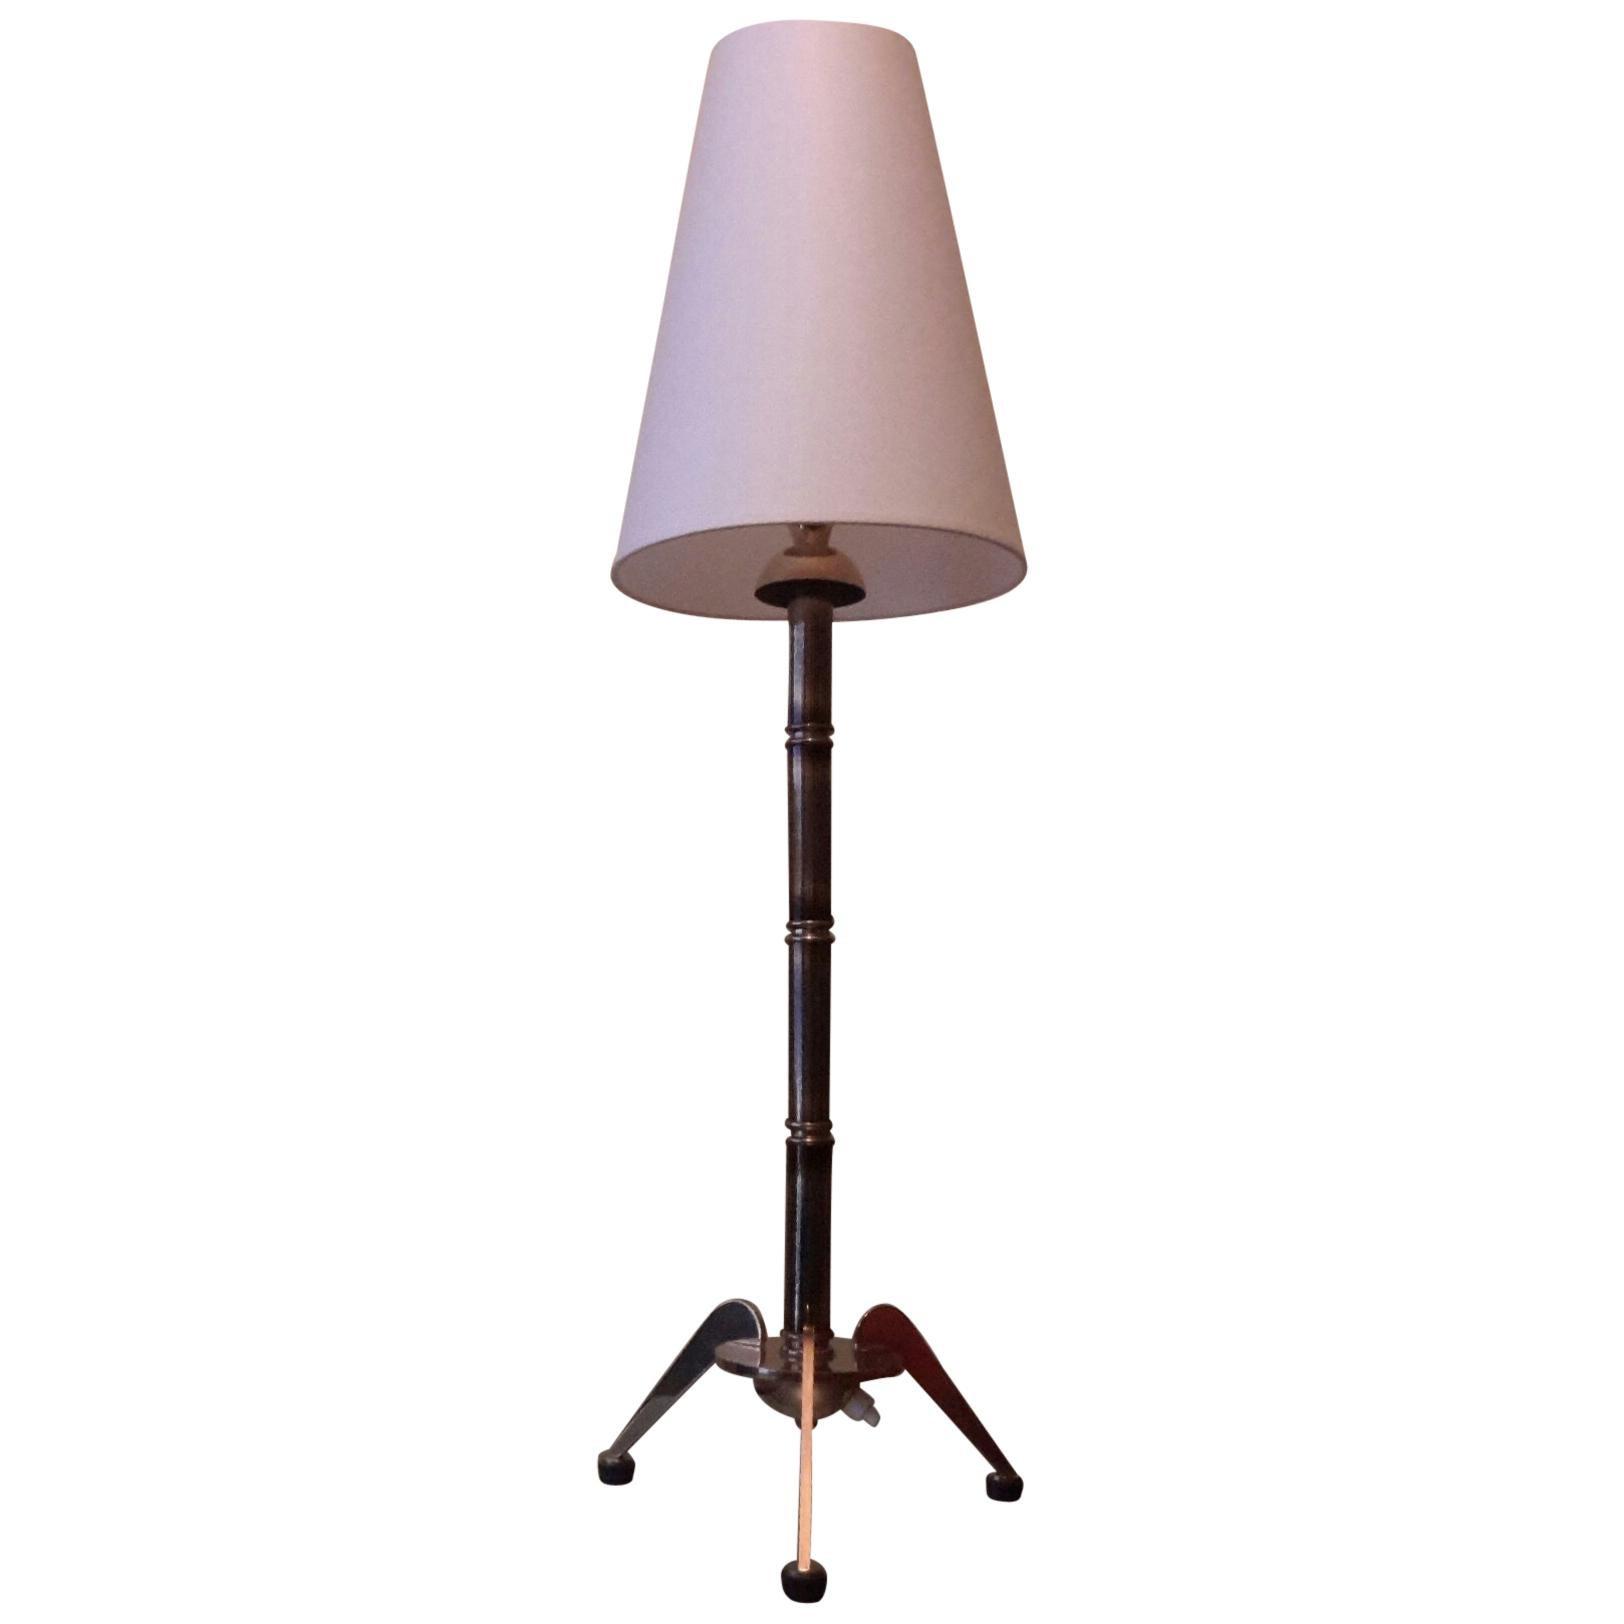 Maison Jansen  Bronze Table Lamp, France, 1950